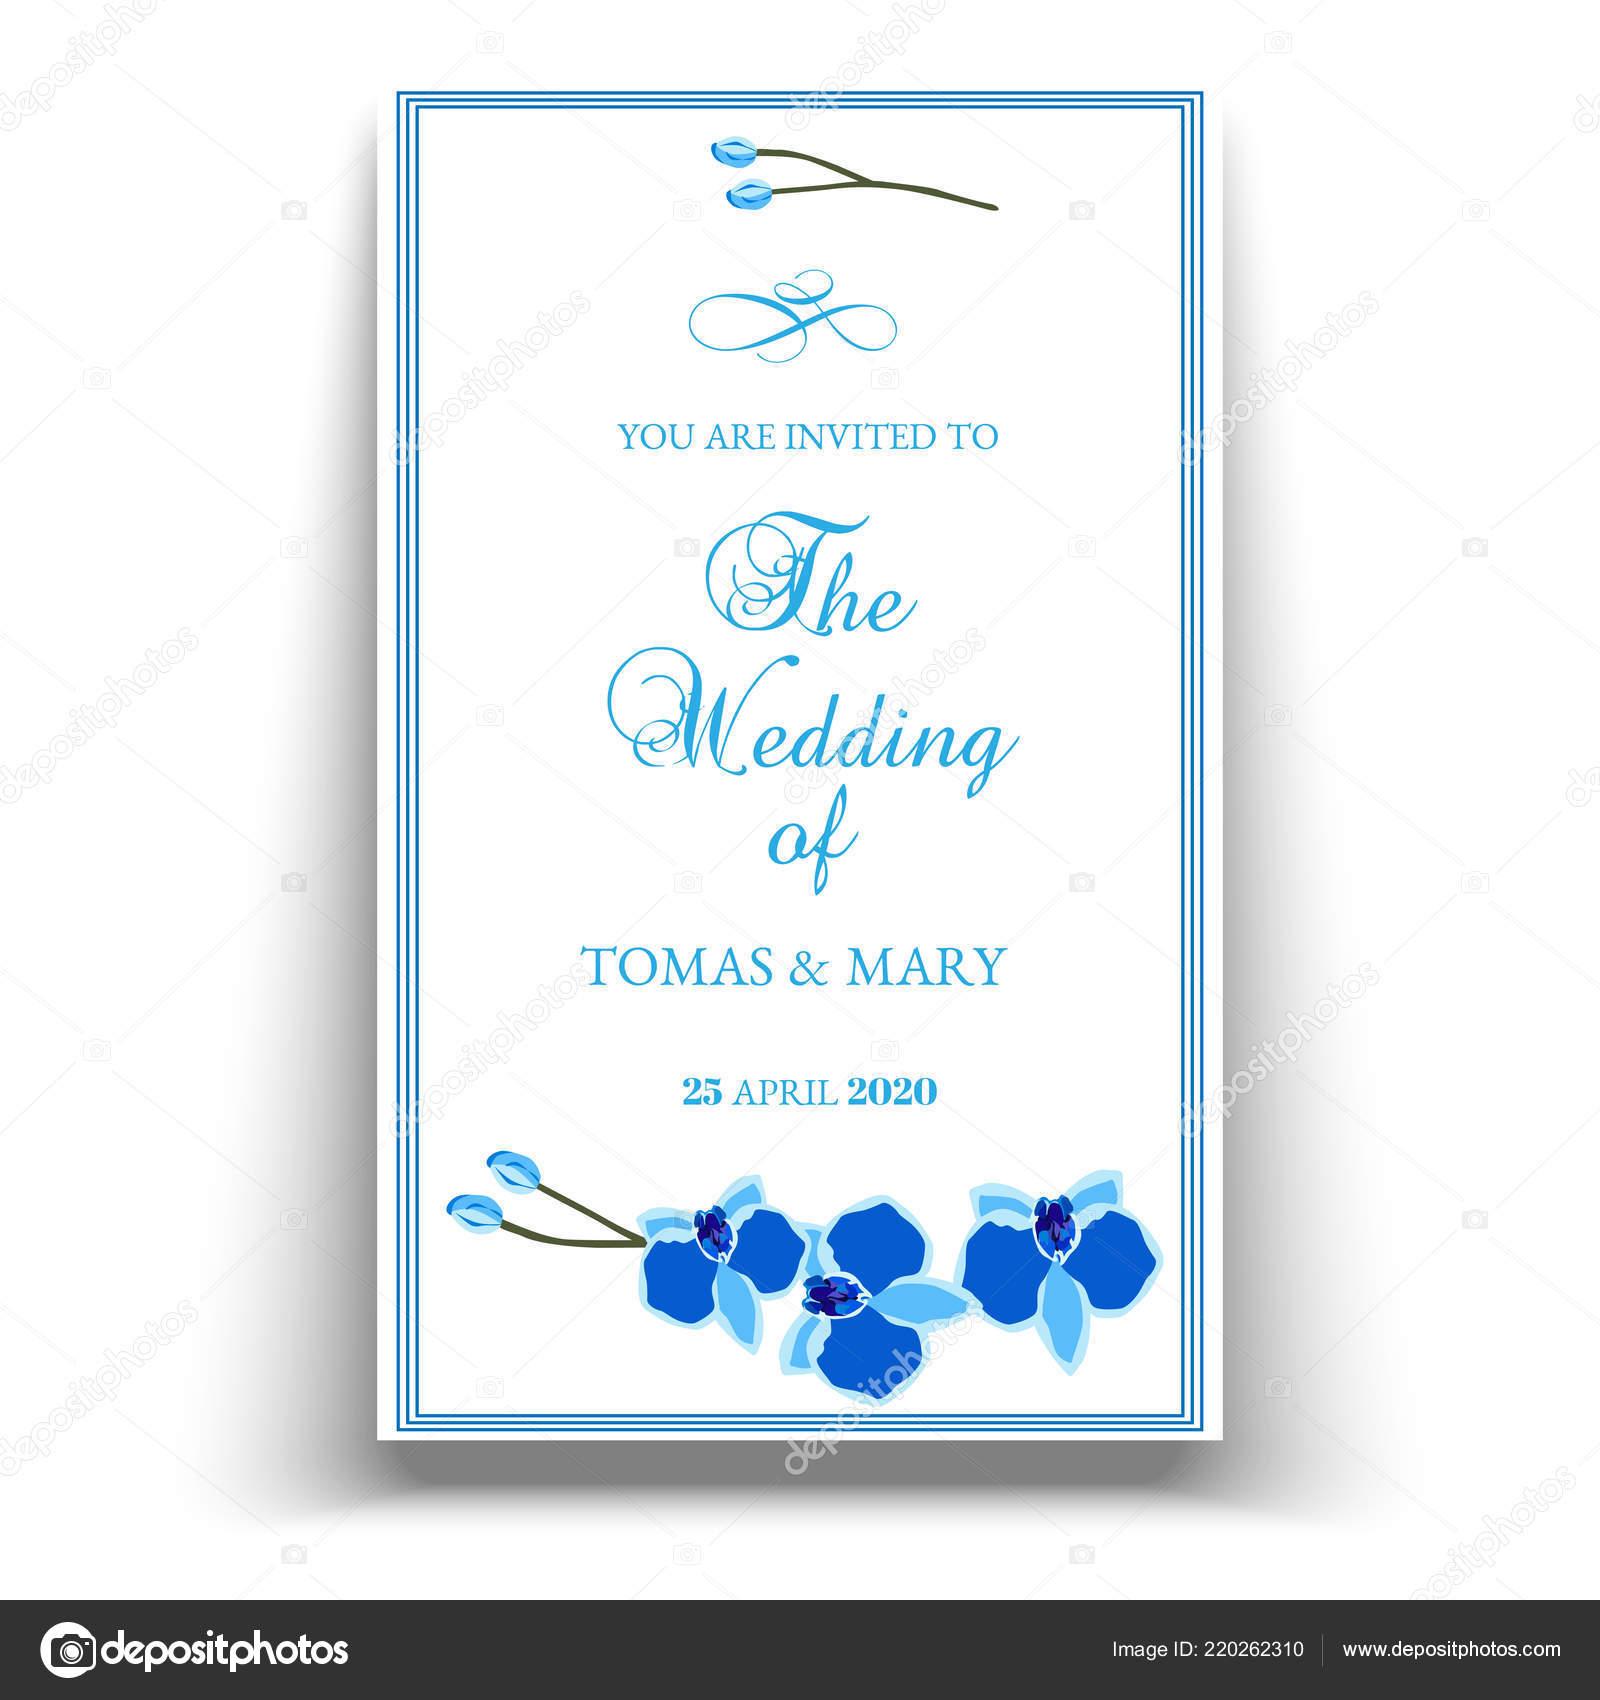 Plantilla Invitación Evento Boda Matrimonio Con Orquídea